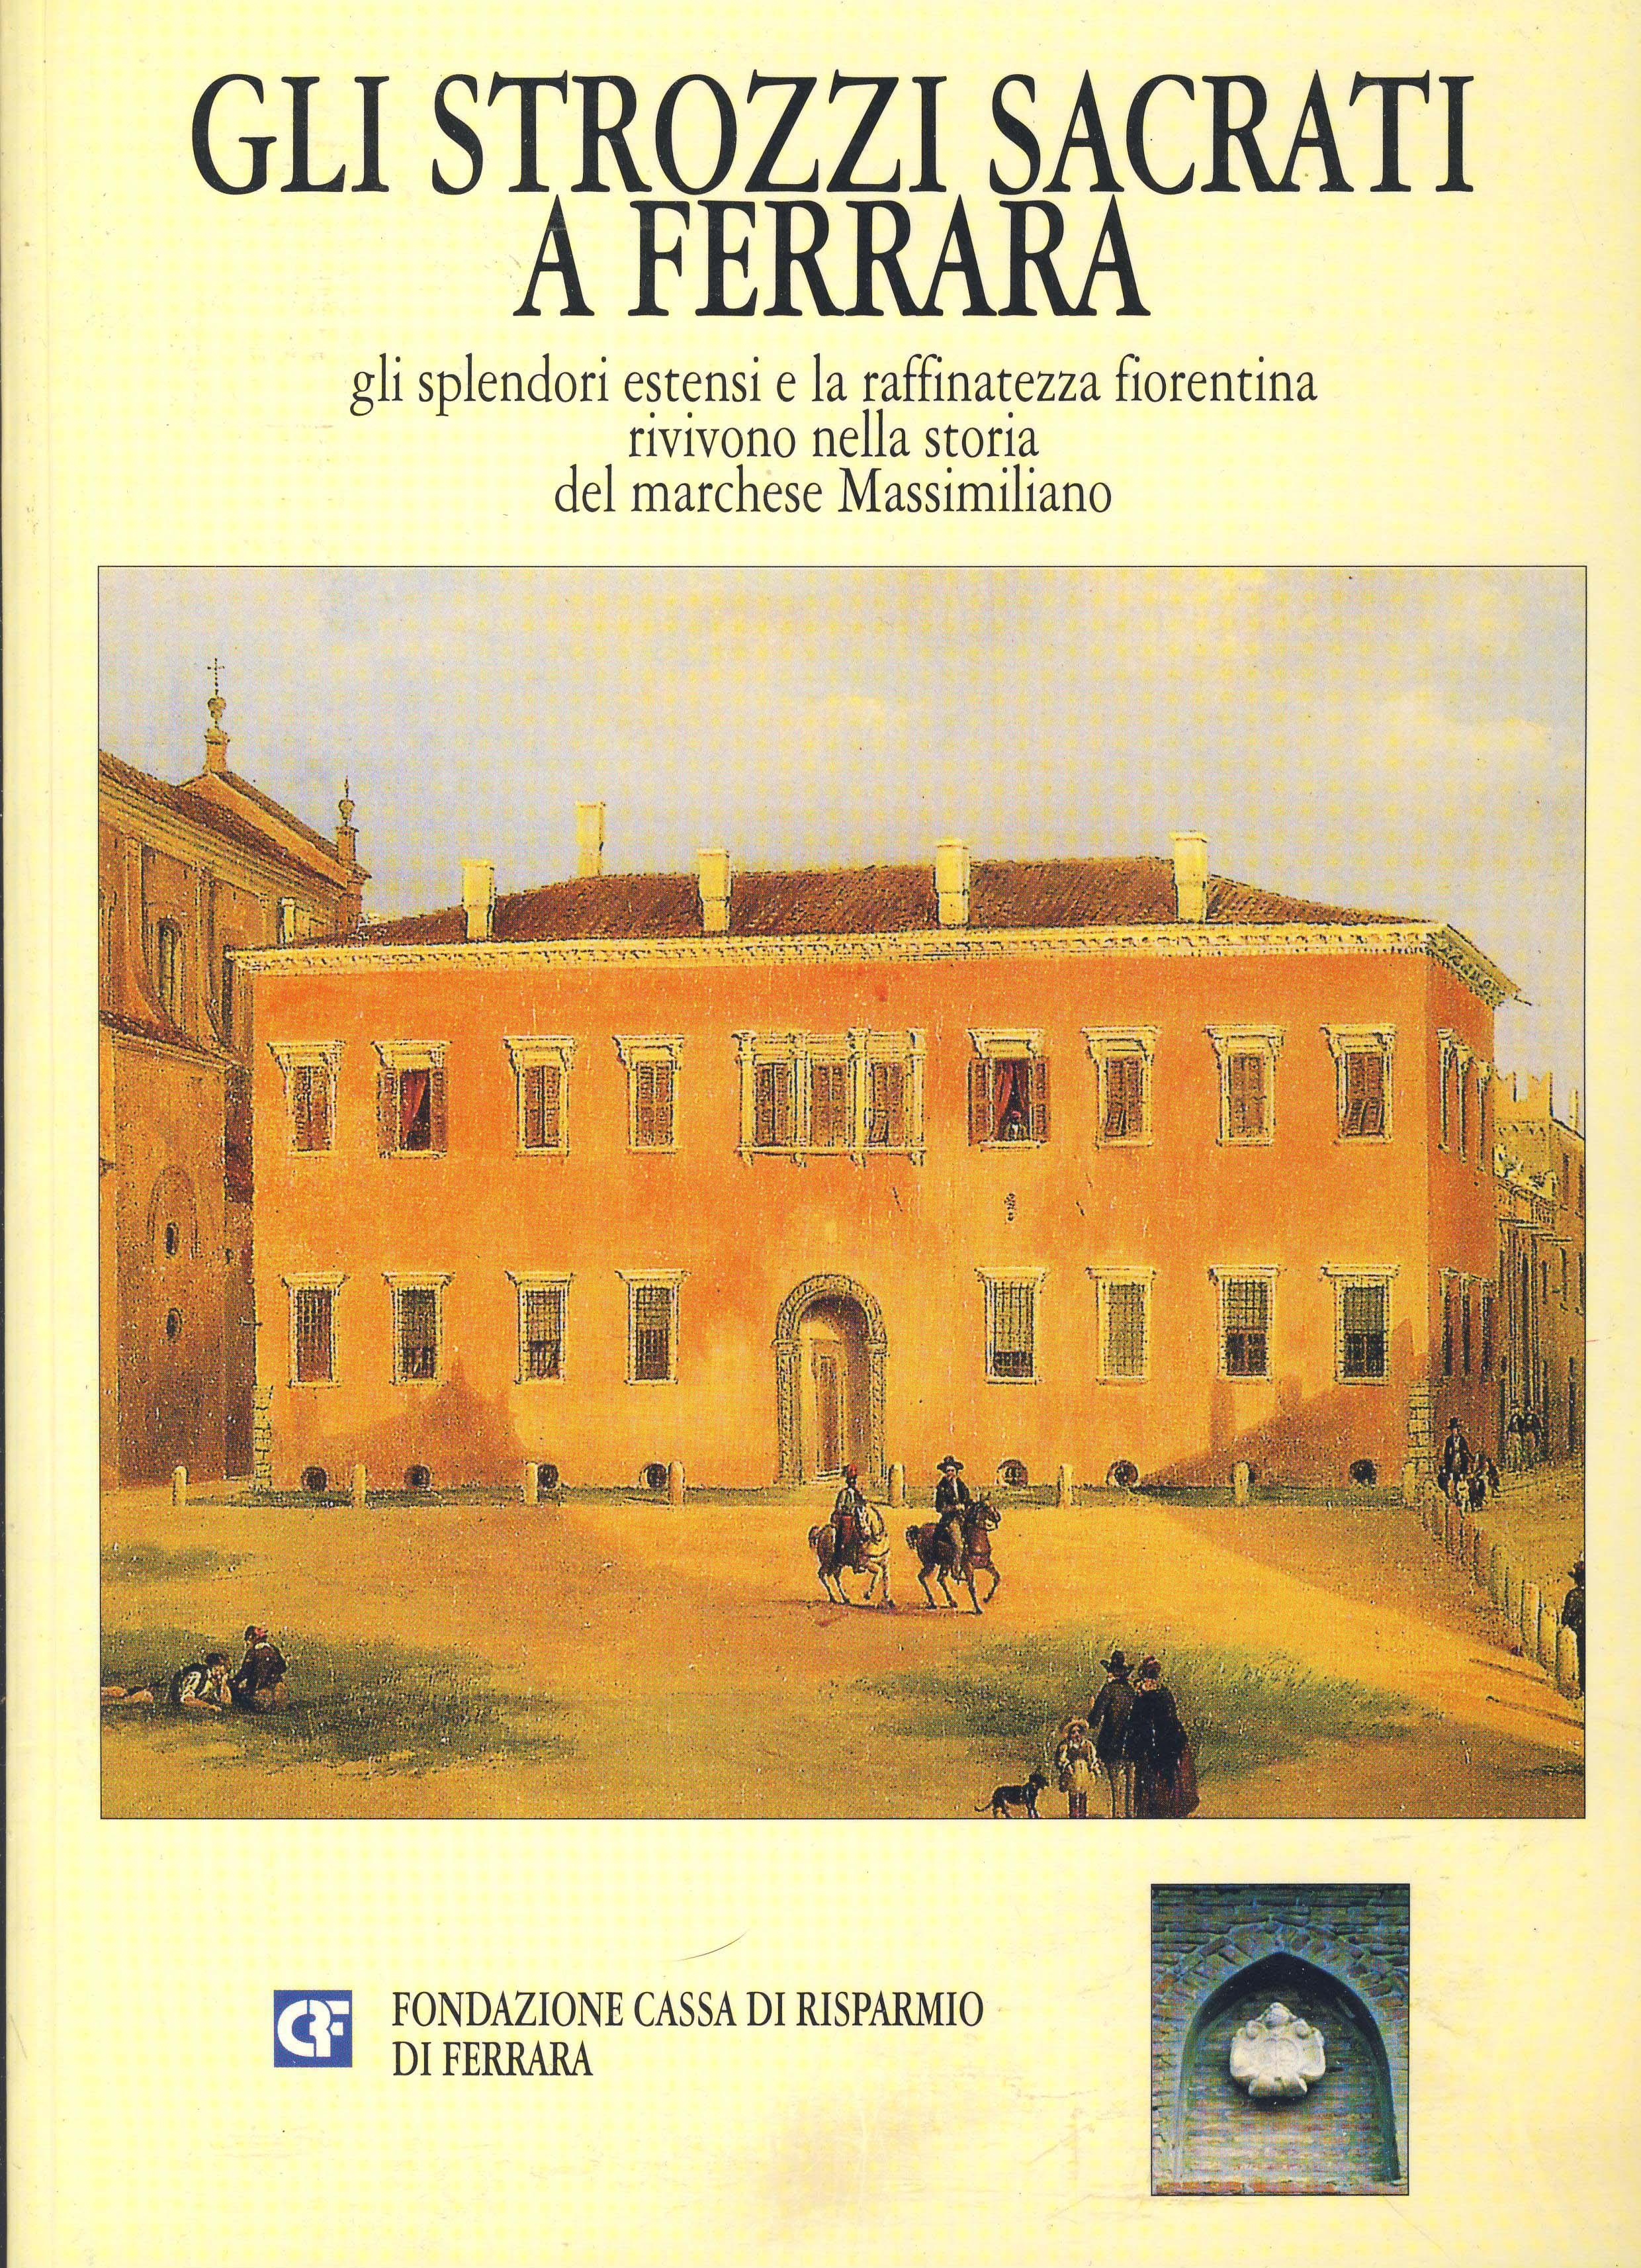 Gli Strozzi Sacrati a Ferrara